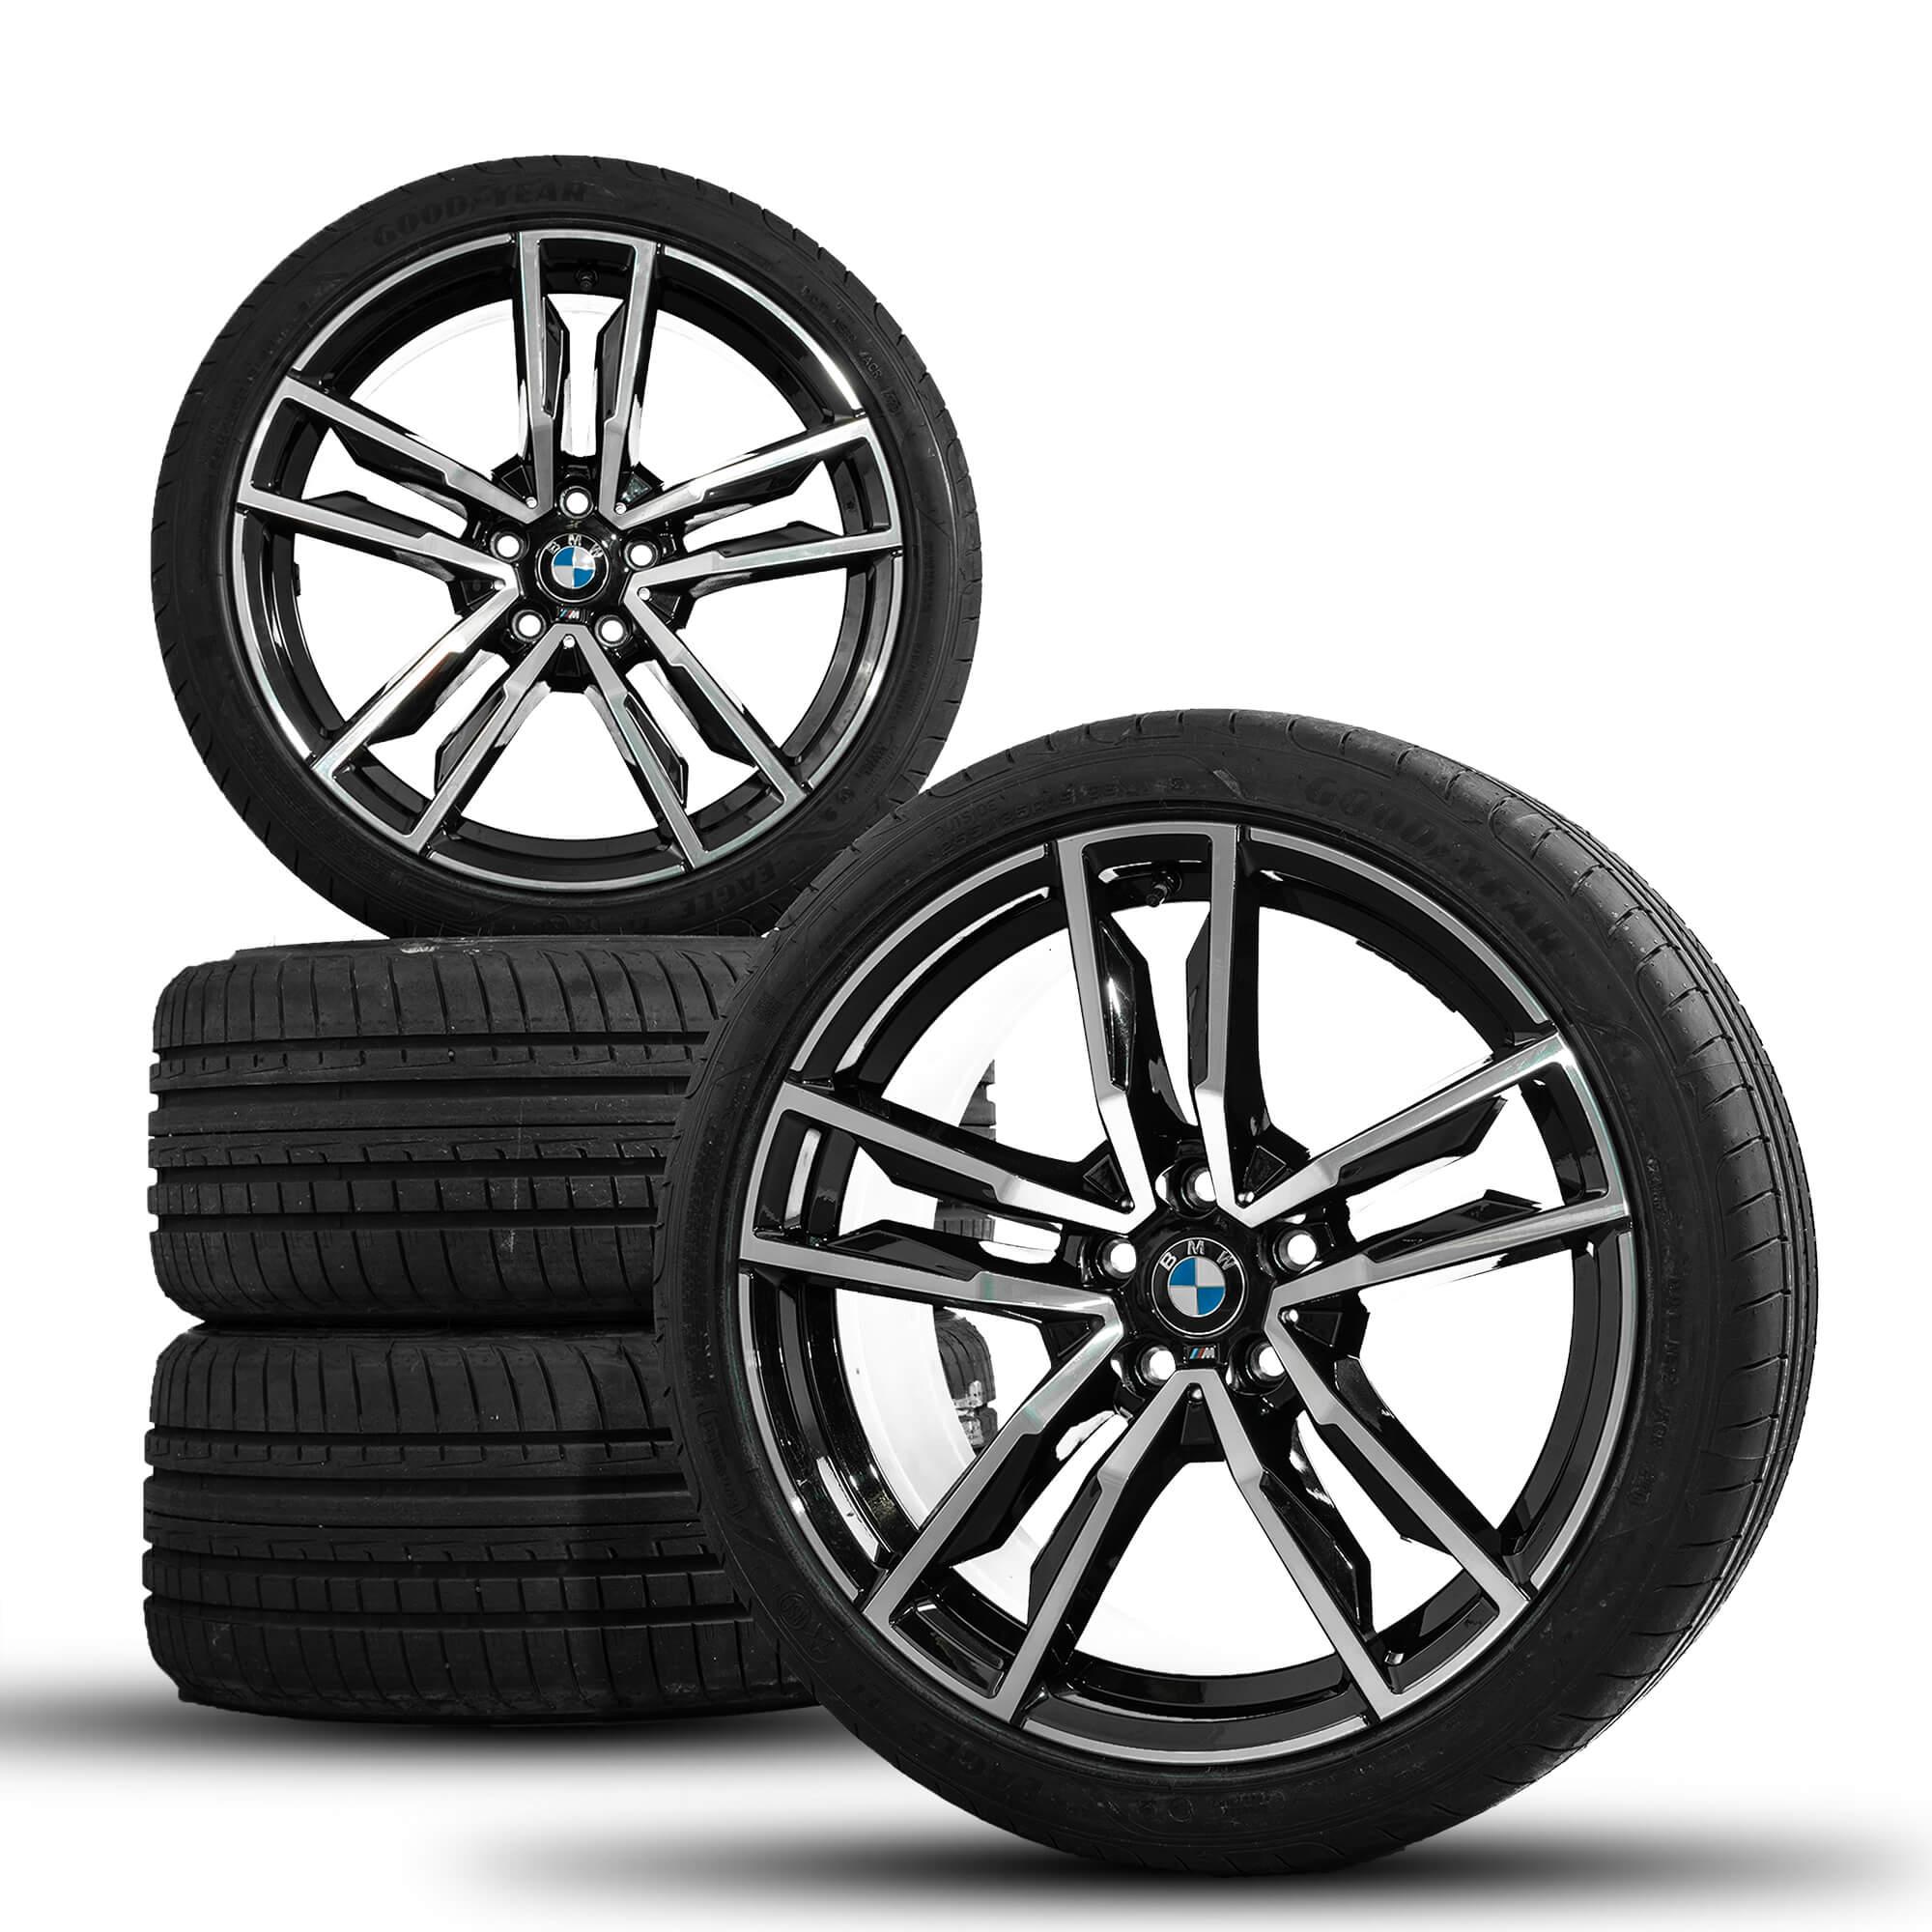 Bmw 19 Inch Rims Z4 G29 Summer Tires Summer Wheels 799 M 8091763